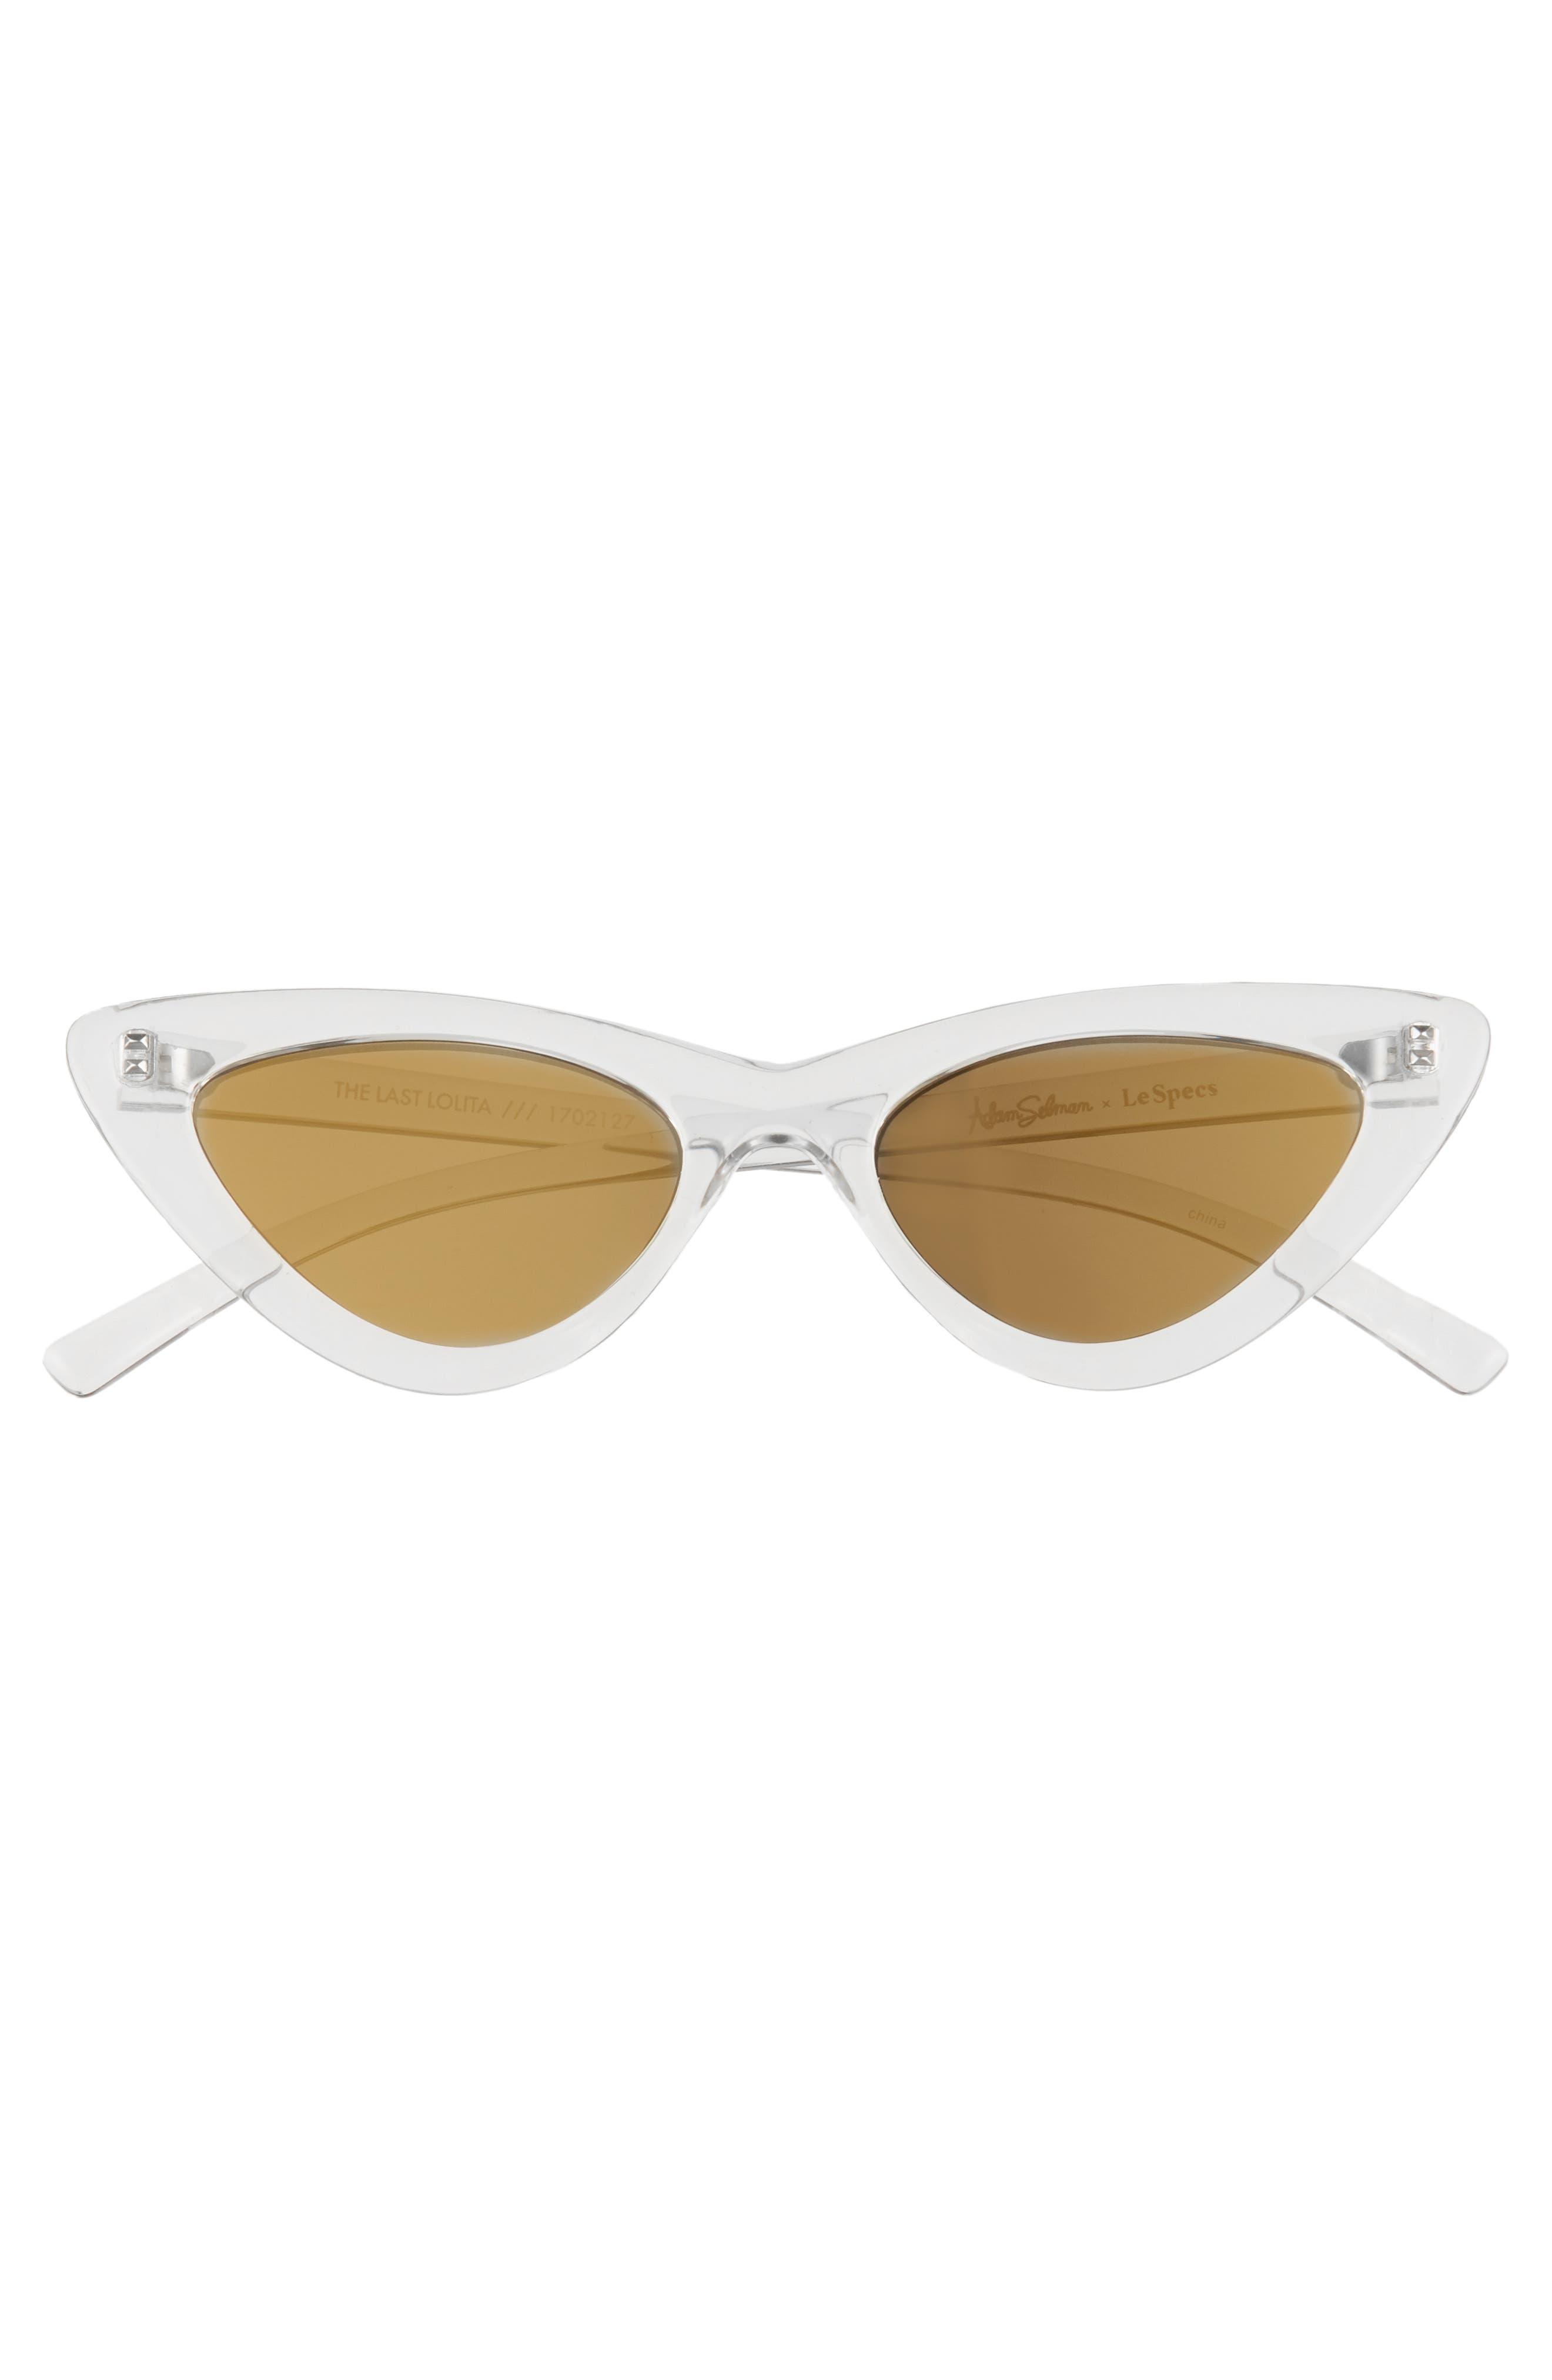 Lolita 49mm Cat Eye Sunglasses,                             Alternate thumbnail 3, color,                             CRYSTAL GREY